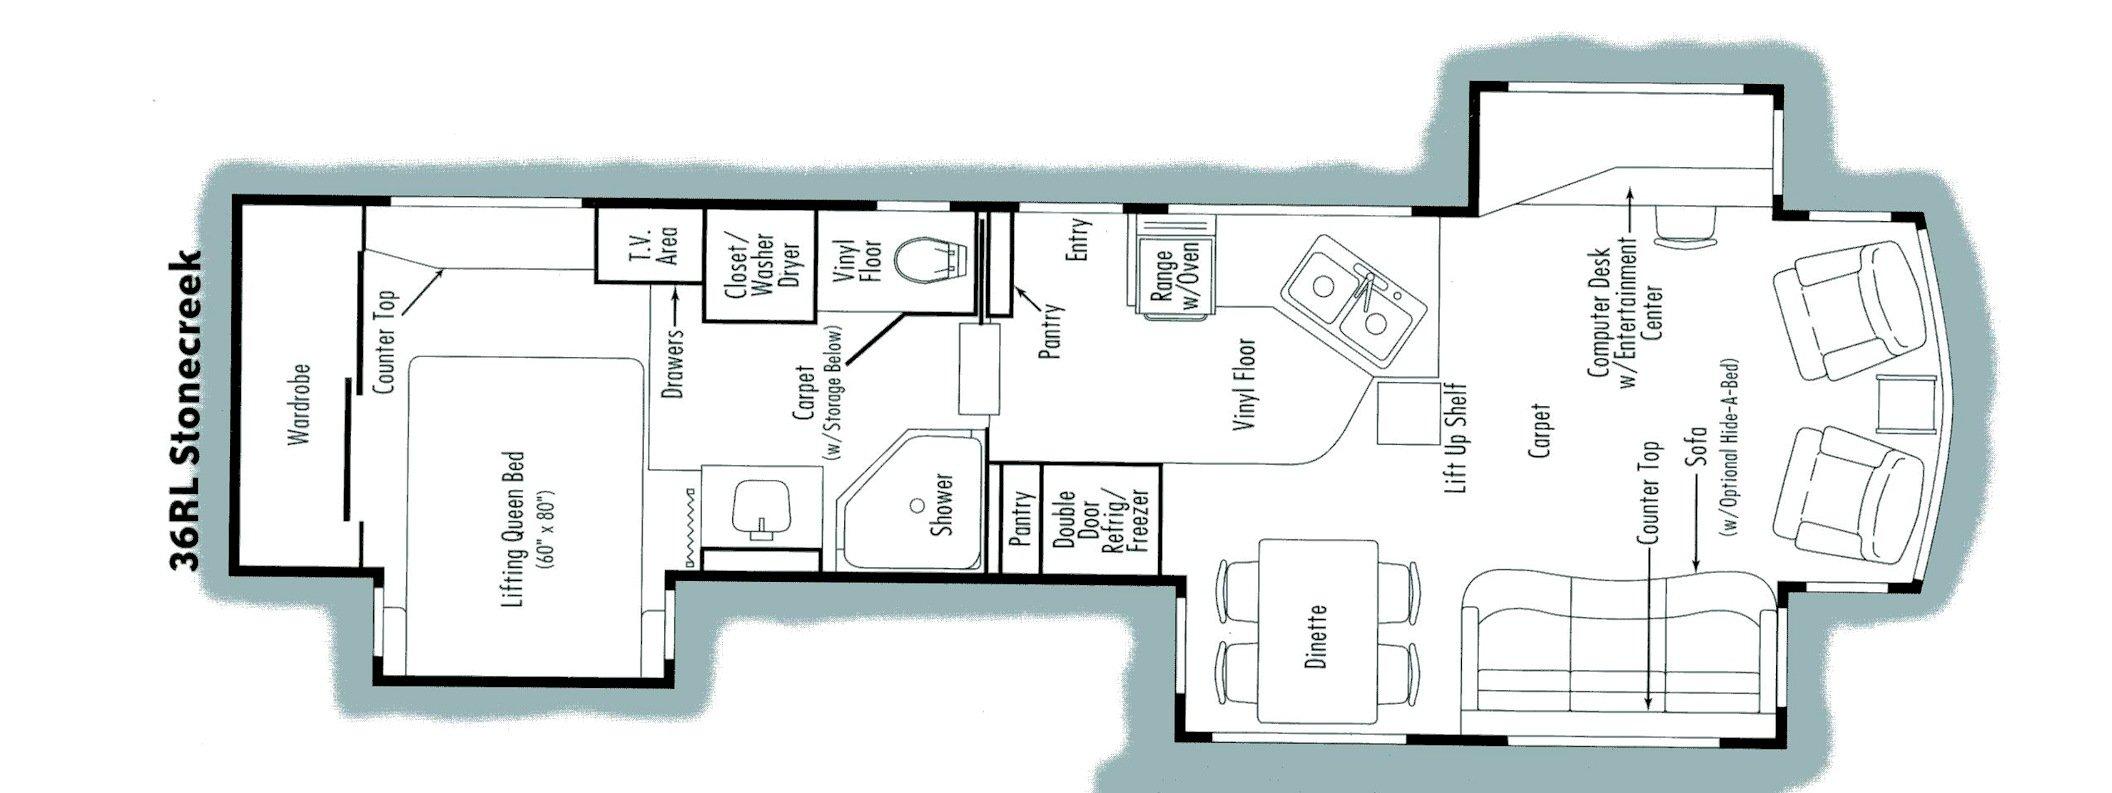 Alpenlite Fifth Wheel Floor Plans TheFloorsCo